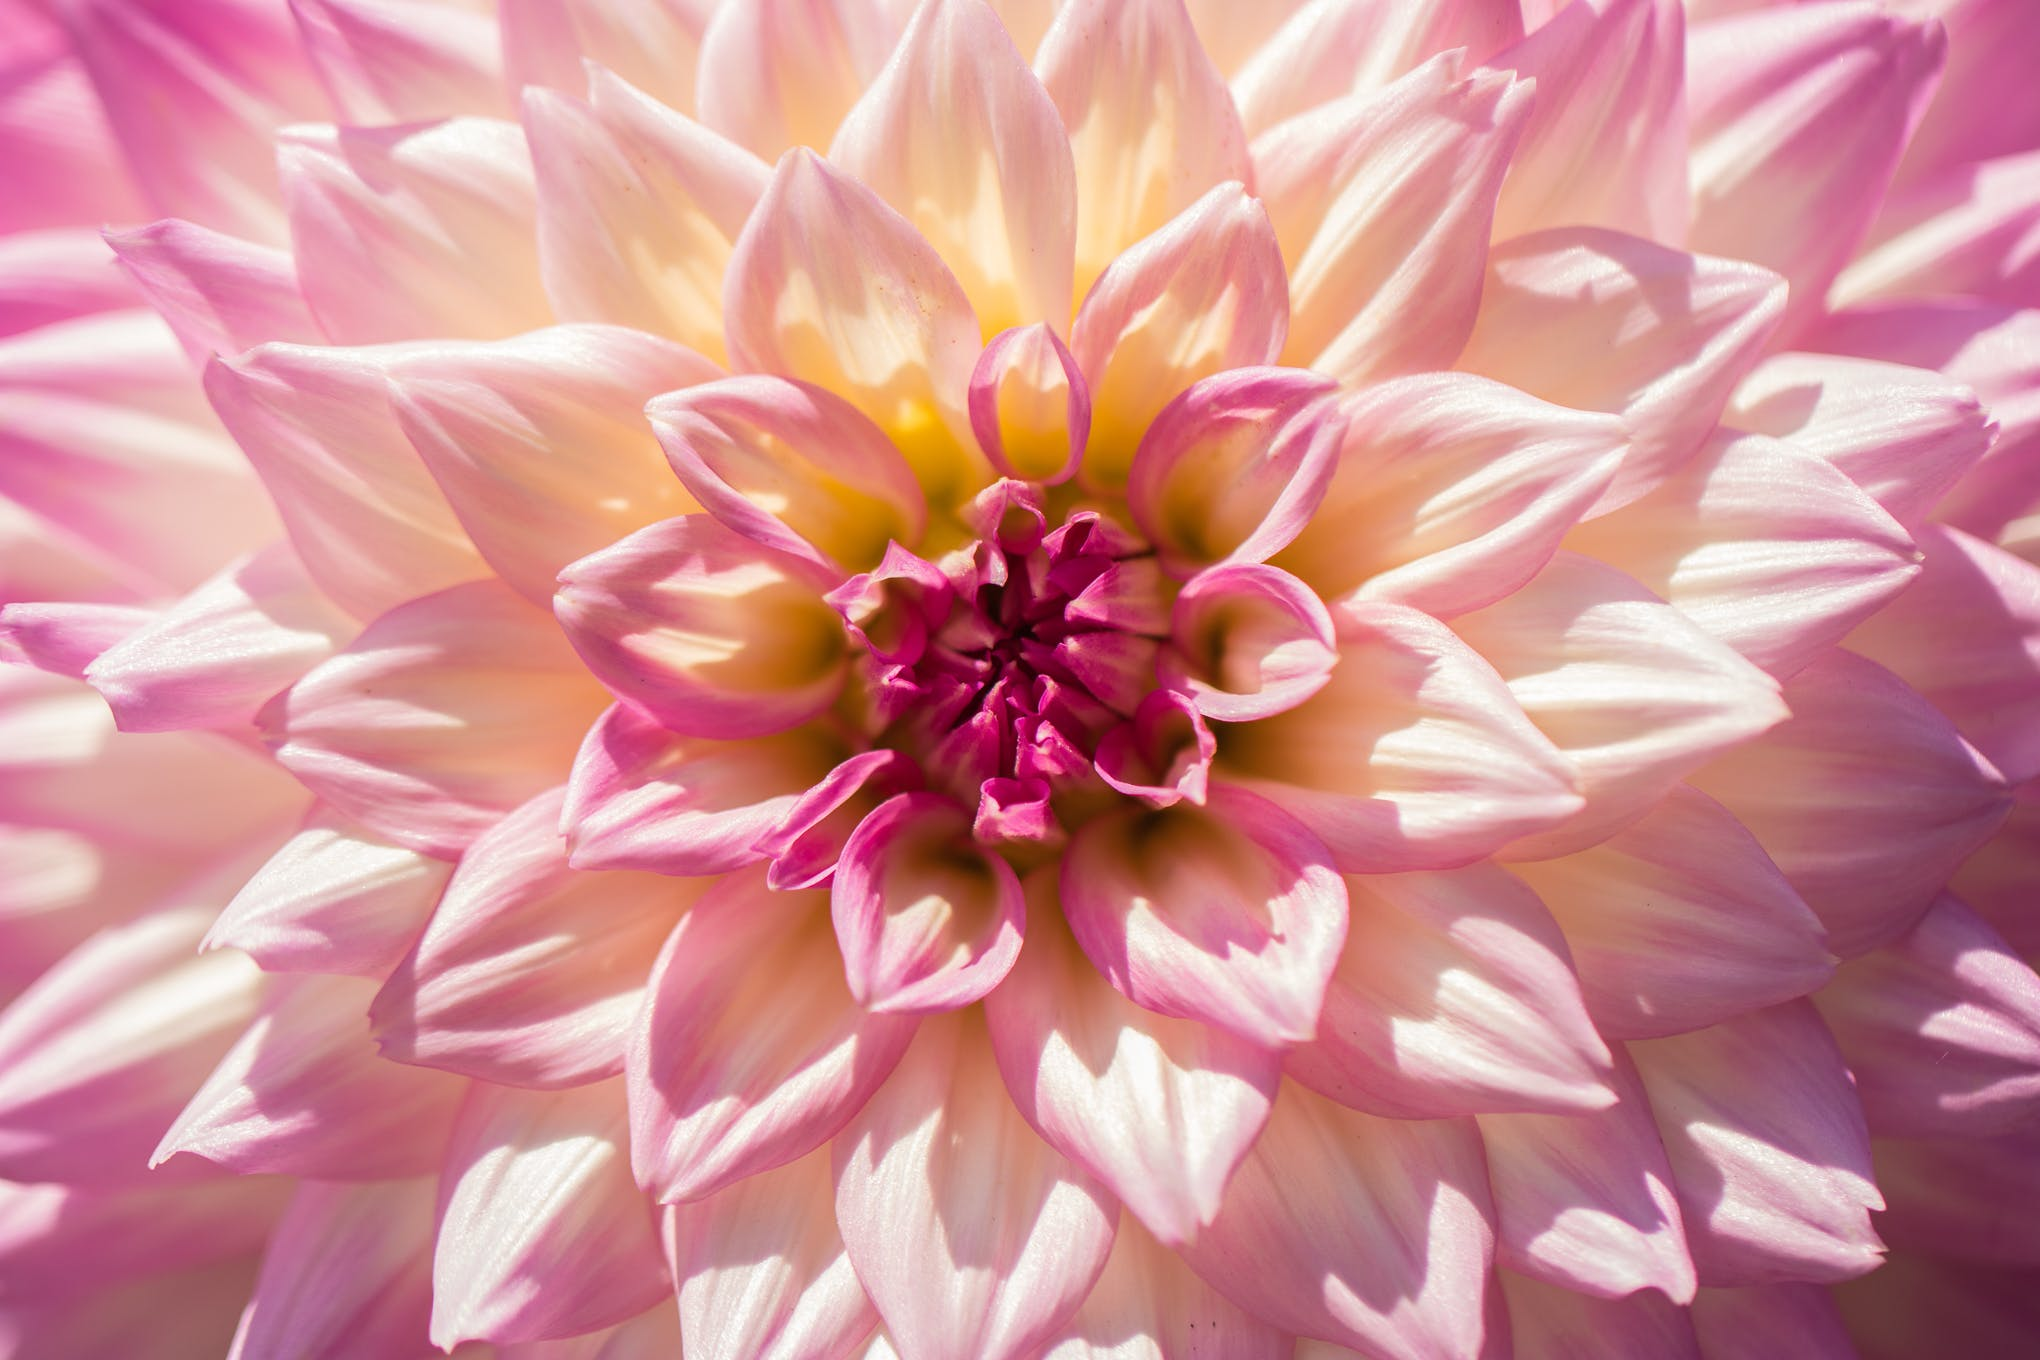 bloom, blossom, chrysanthemum